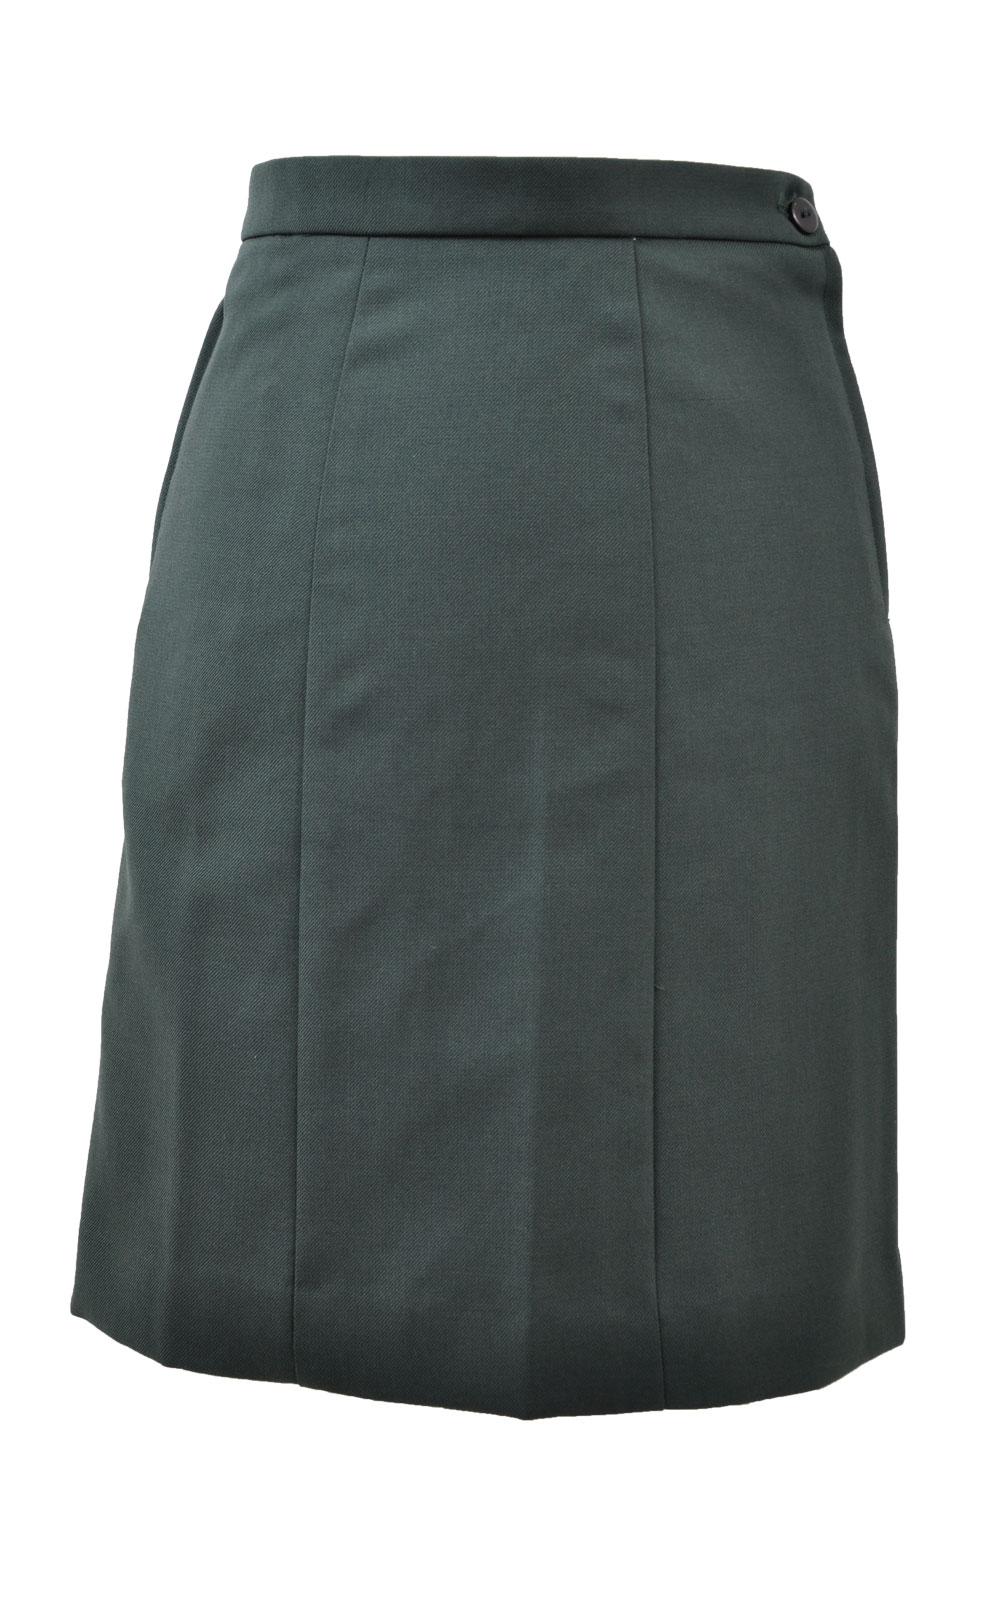 Picture of Coleraine High School Junior Skirt